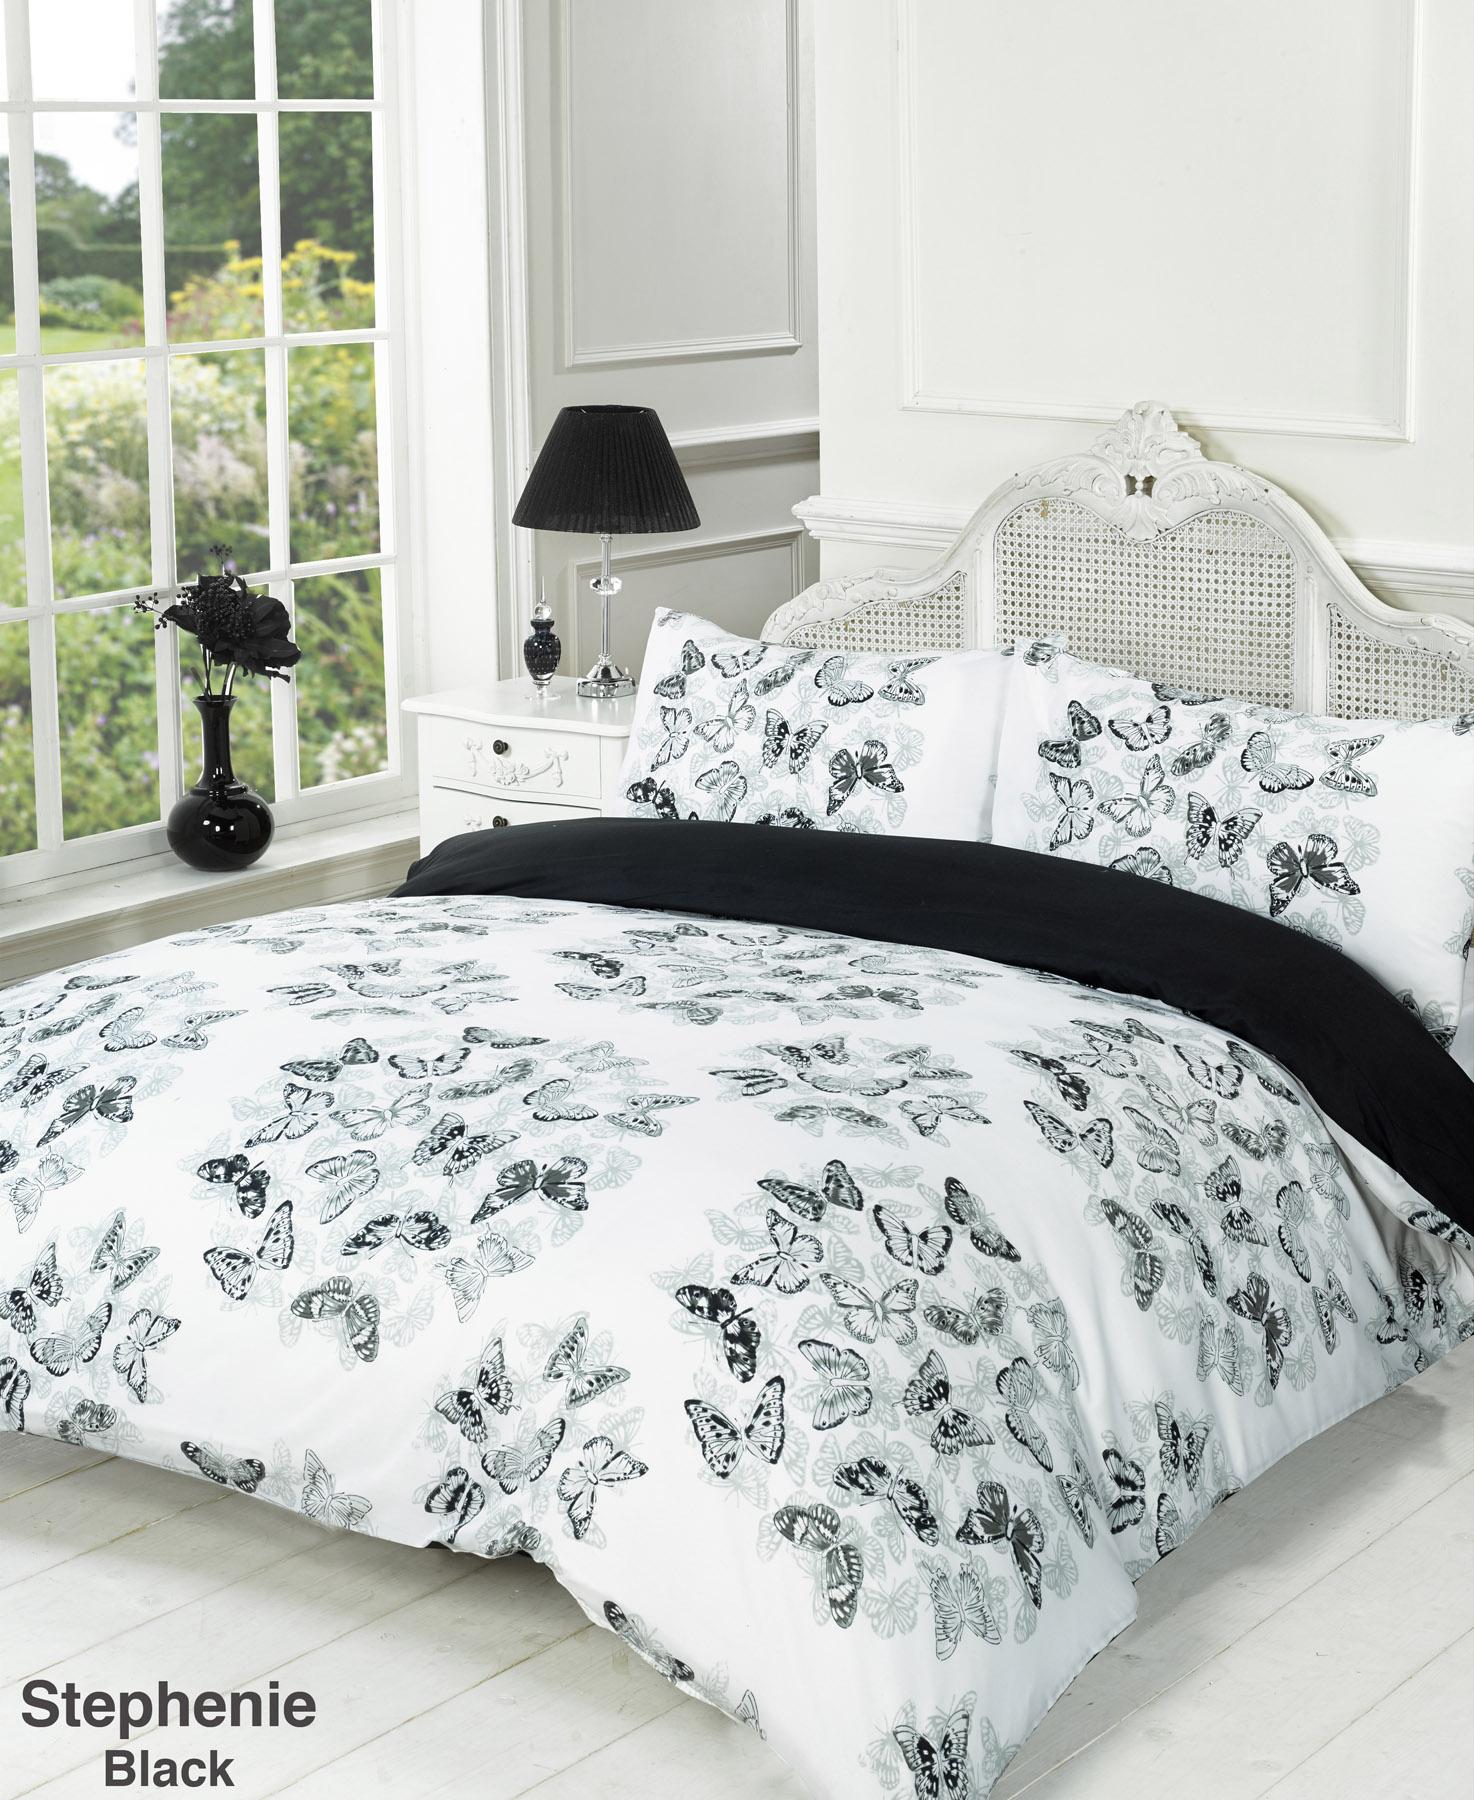 Duvet Quilt Cover Bedding Set Black White Single Double King ... : super single quilt cover size - Adamdwight.com